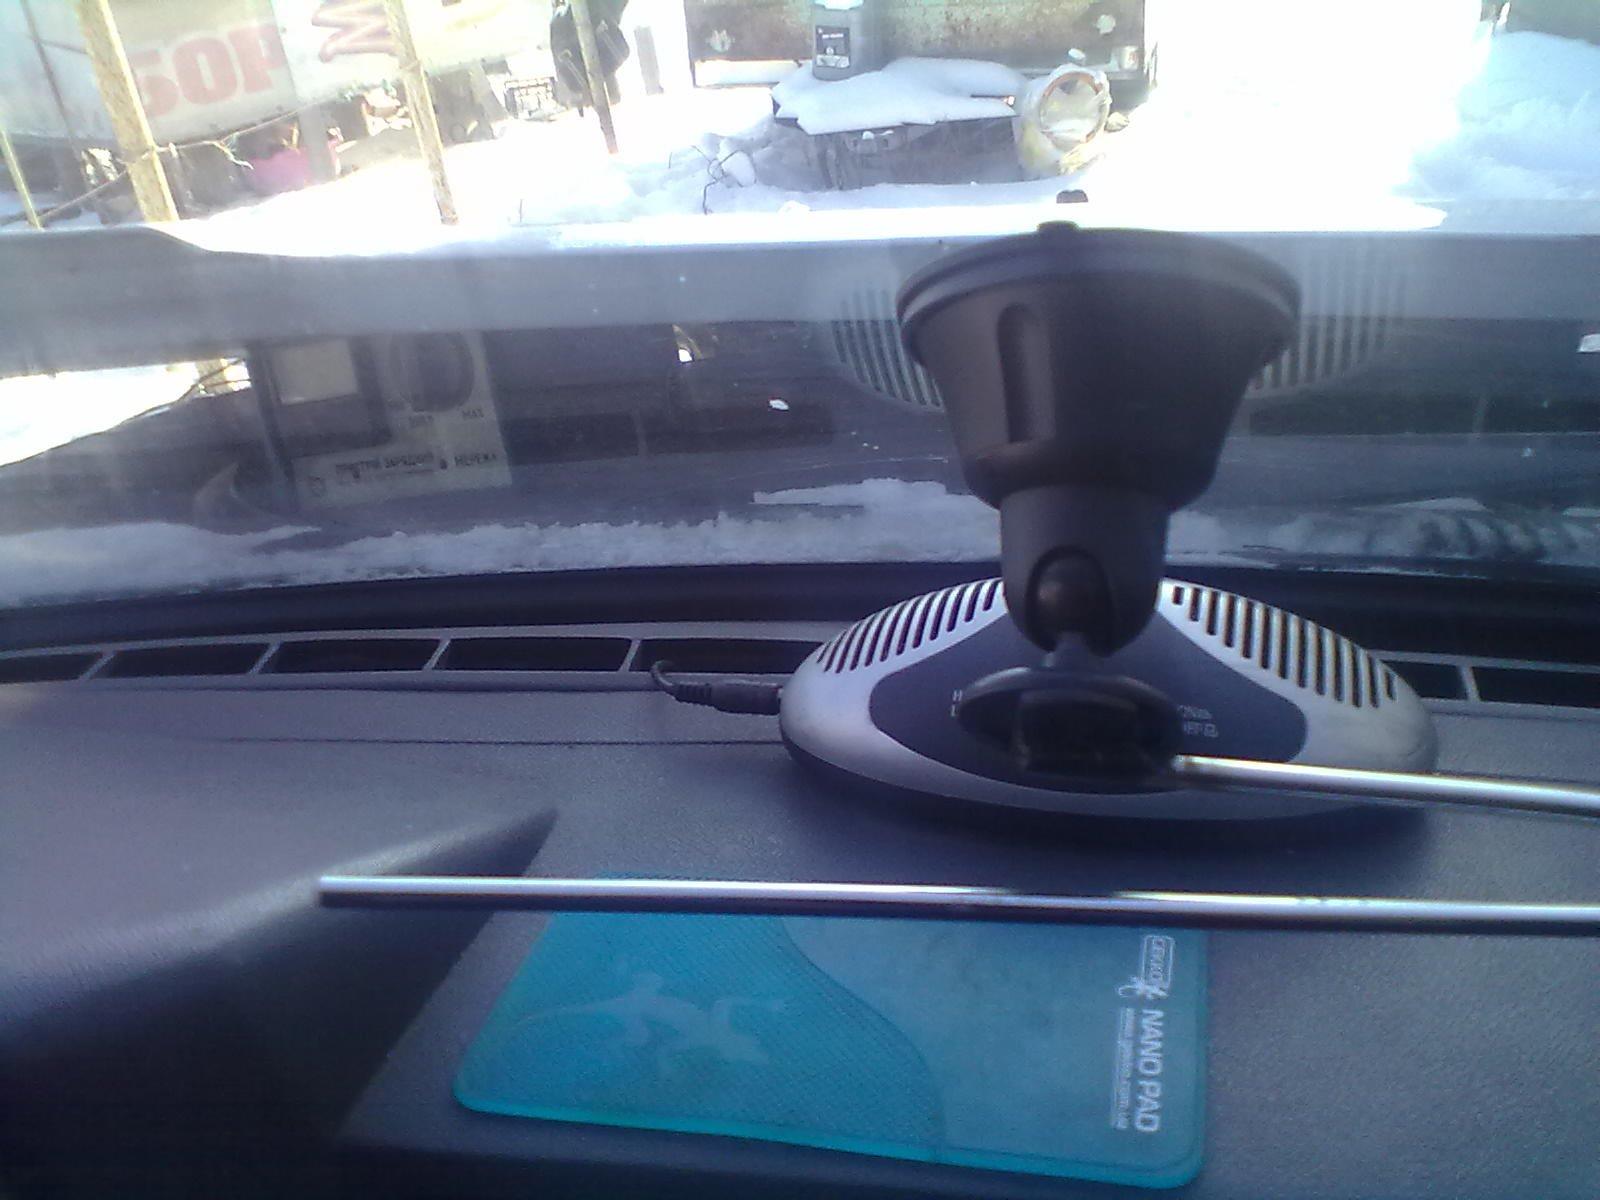 Штатив для планшета в авто за 1 час